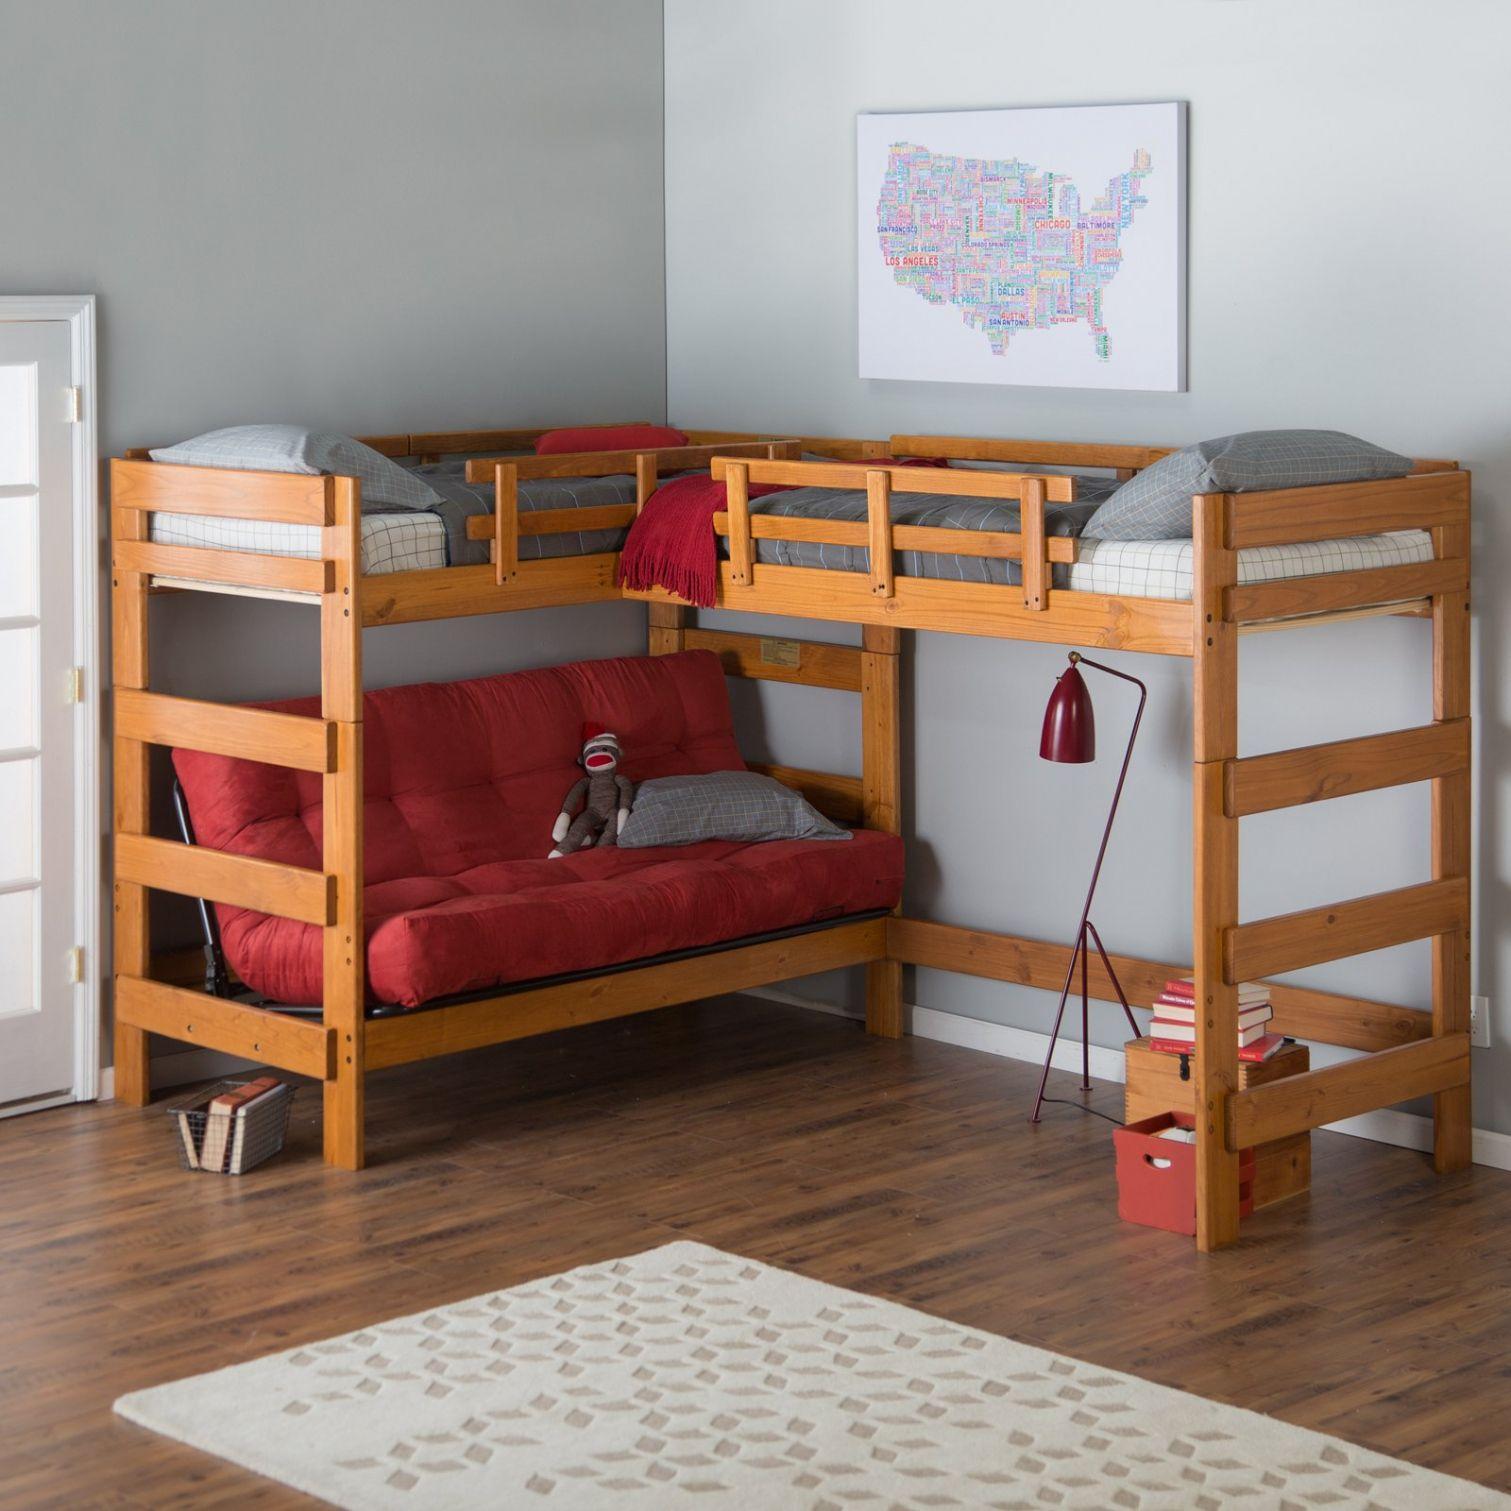 Under loft bed ideas   Loft Bunk Beds with Storage  Simple Interior Design for Bedroom